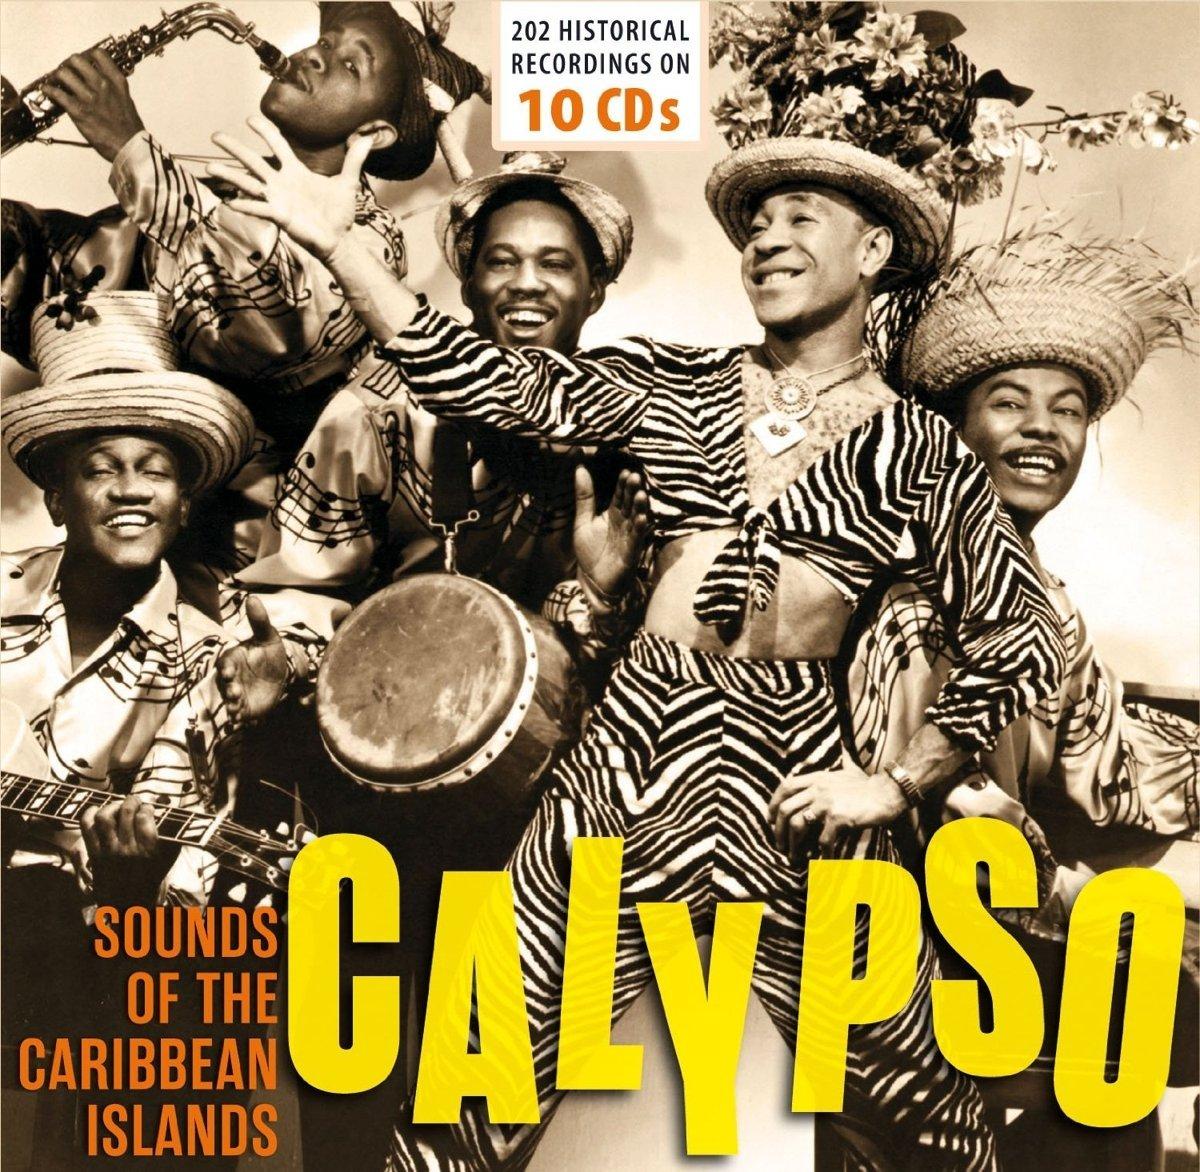 Calypso - Sounds of the Caribbean Islands